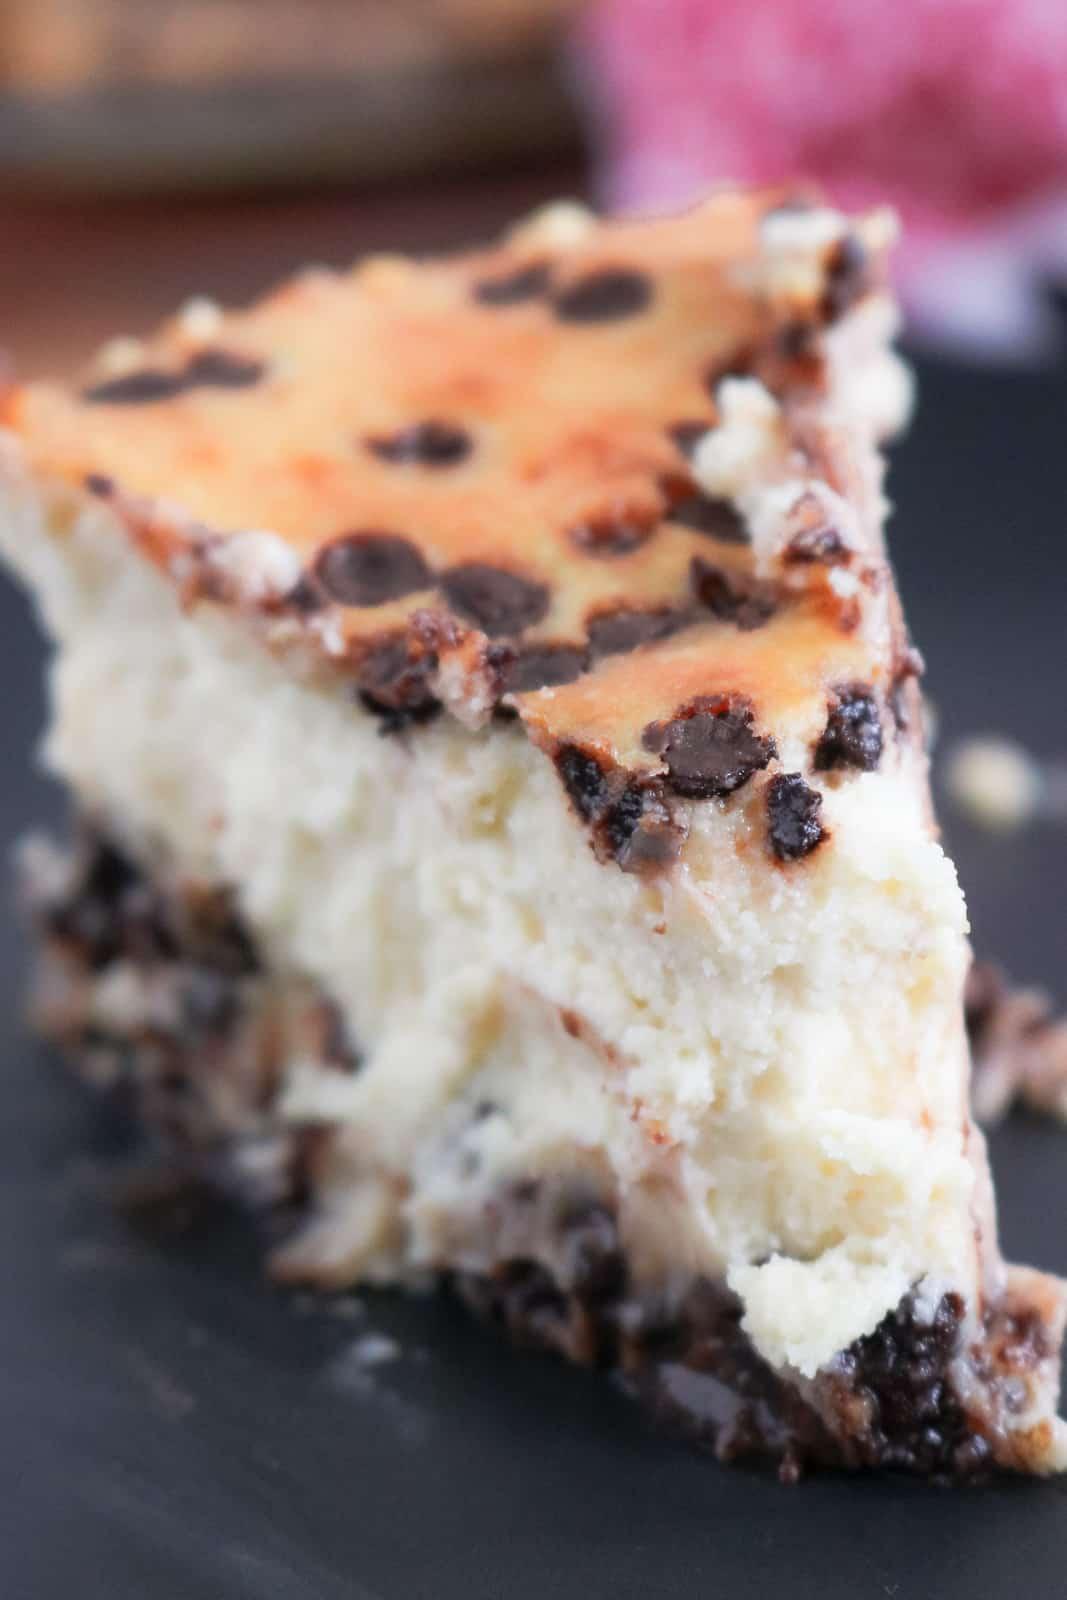 Cheesecake slice on black plate